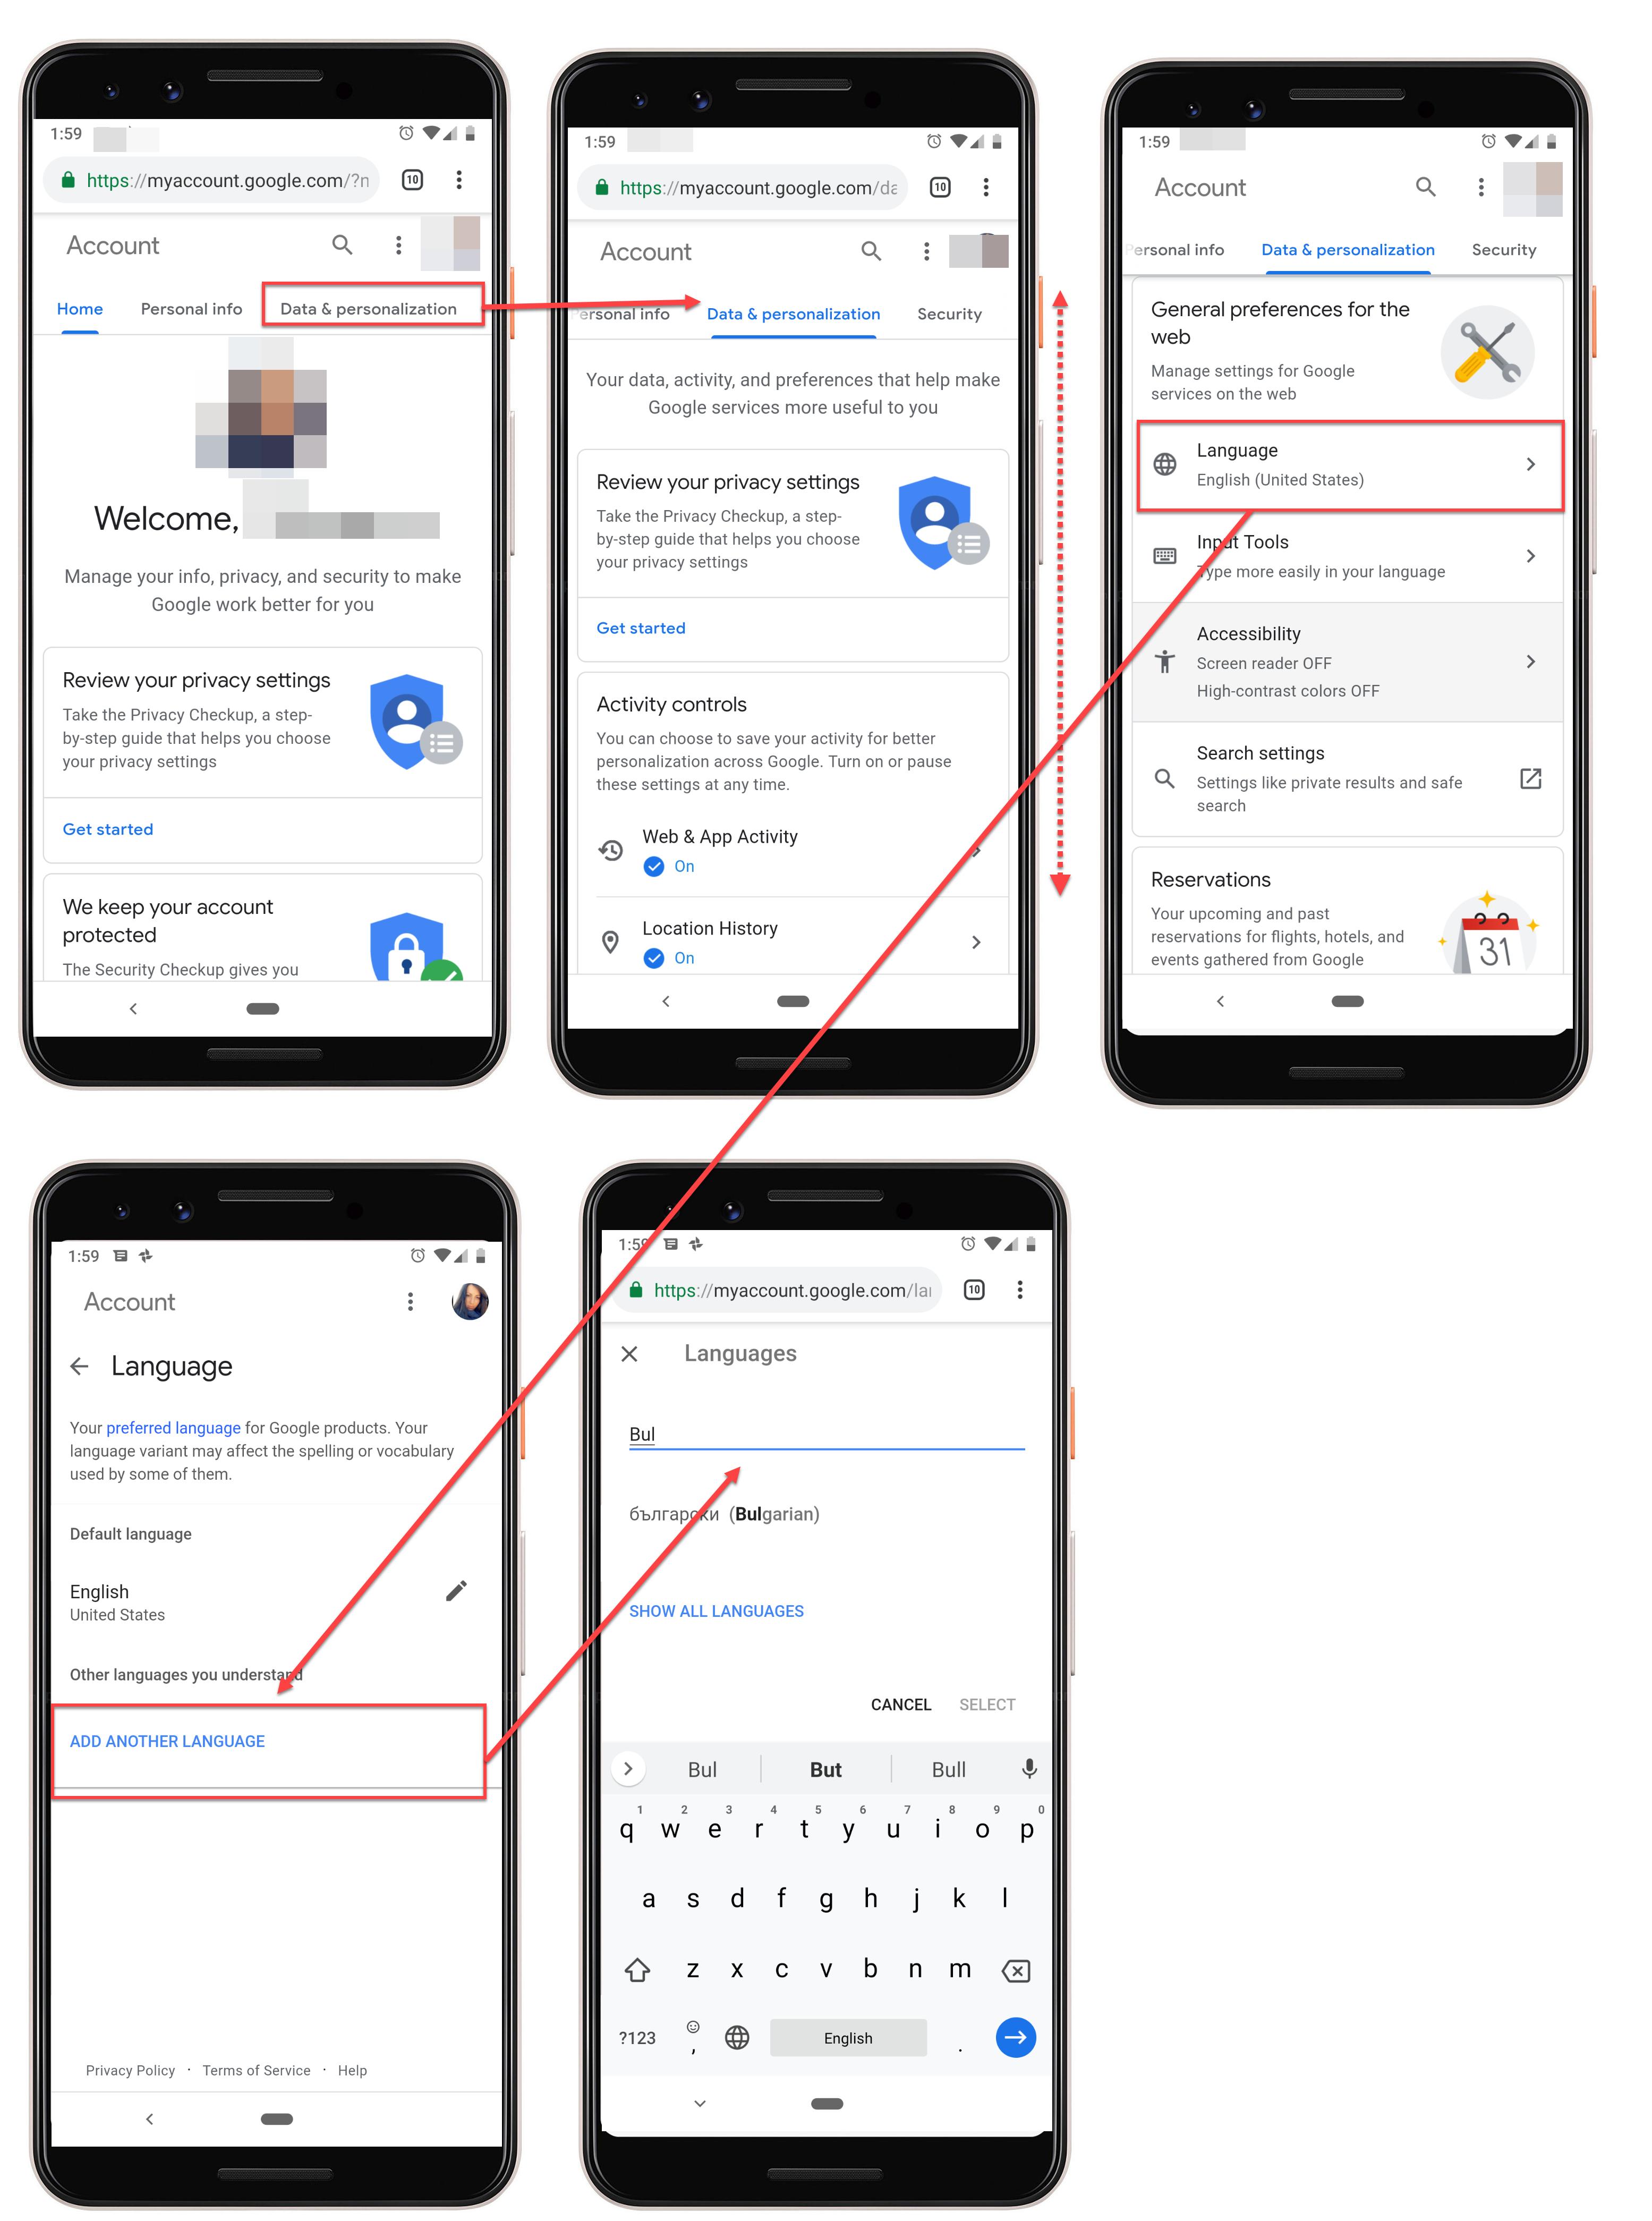 Google Cloud Language Settings on Android